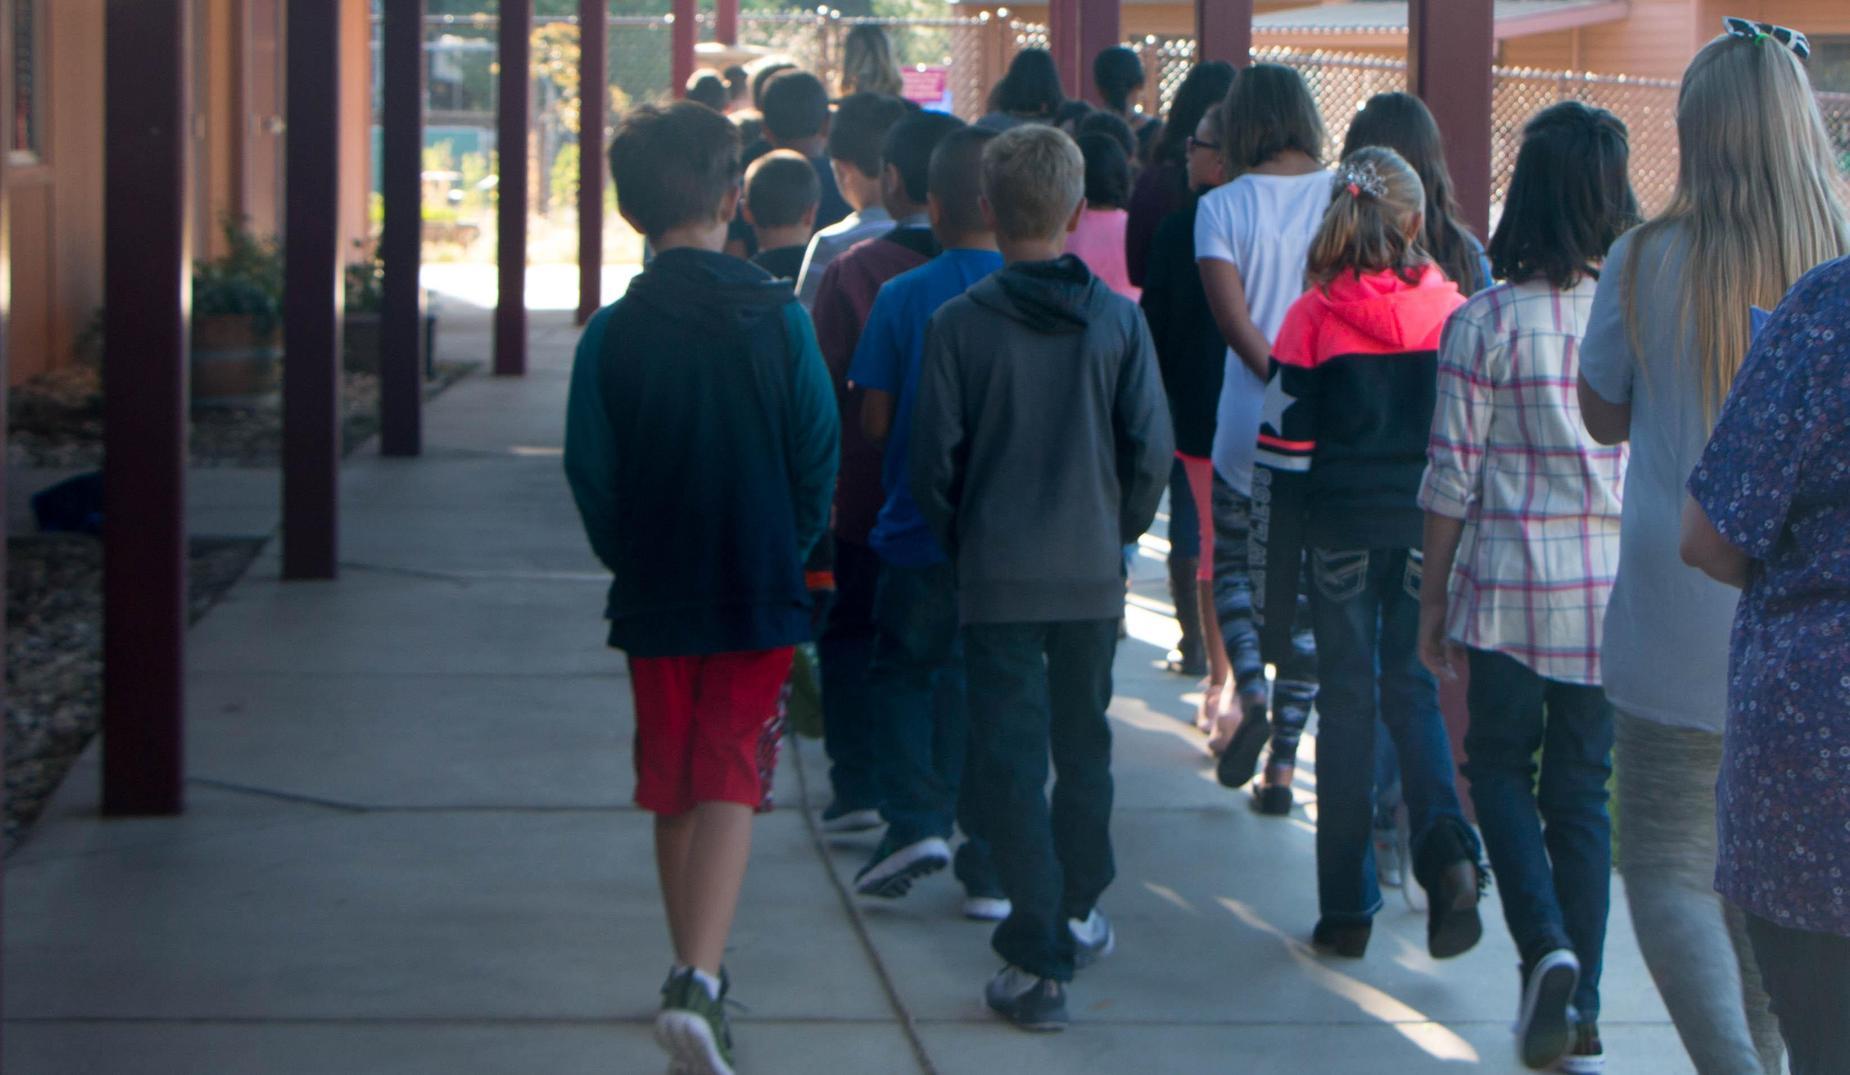 Students walking down the hallway